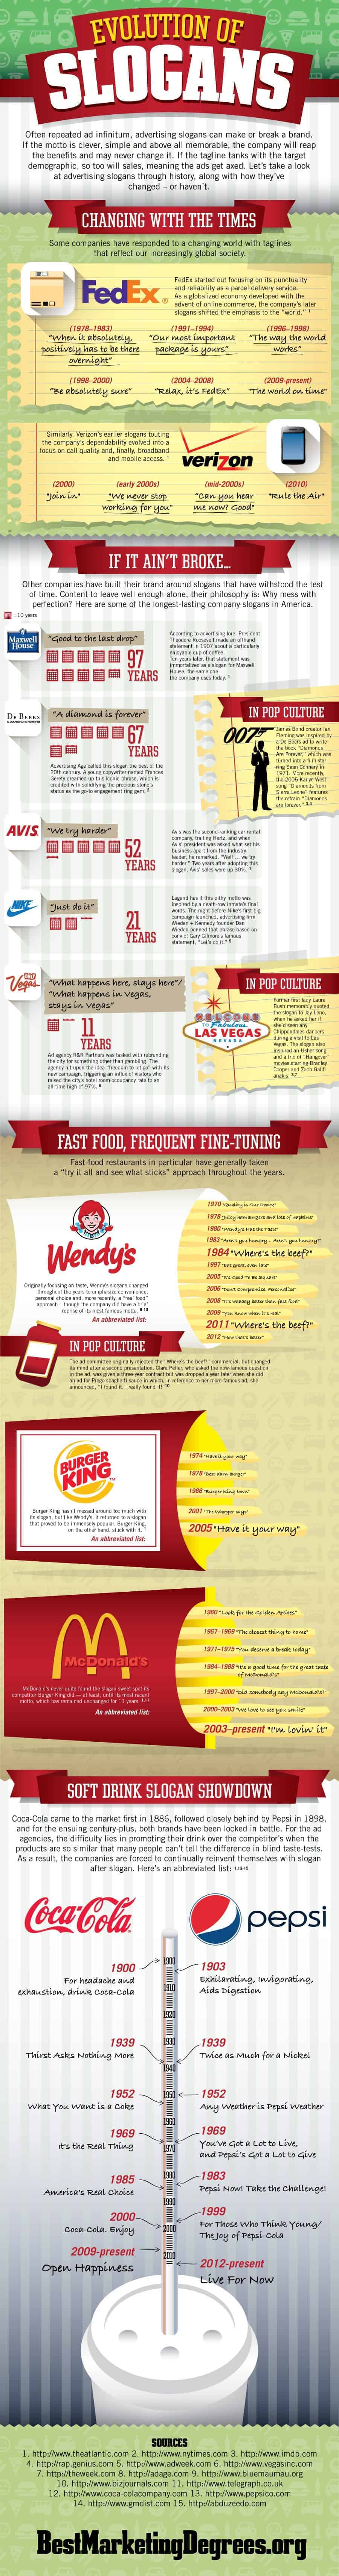 business slogans evolution infographic